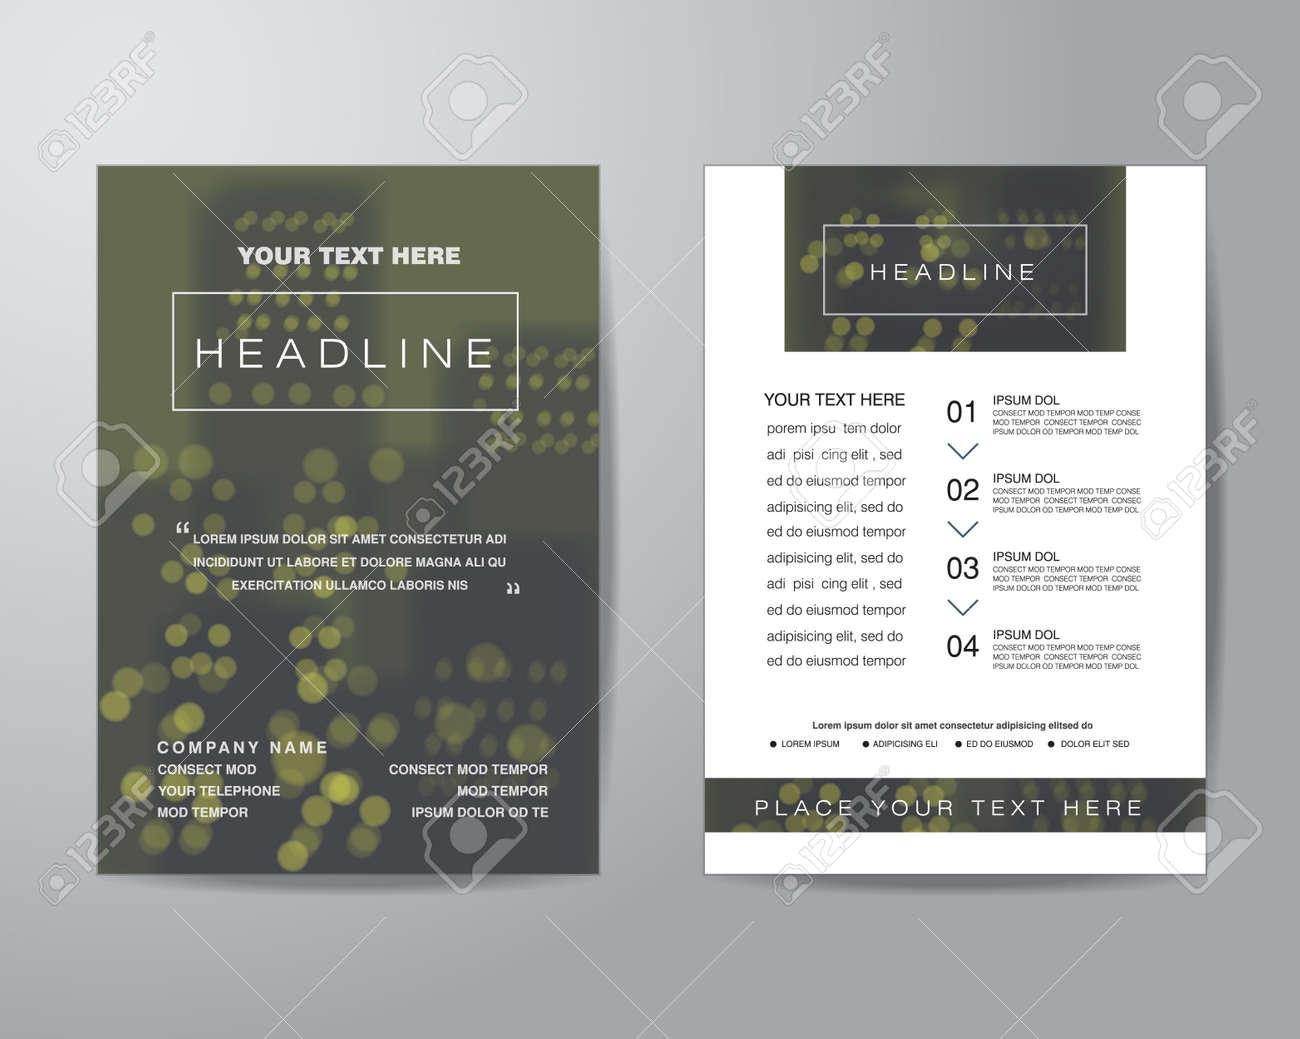 simple flyer design templates - Gidiye.redformapolitica.co